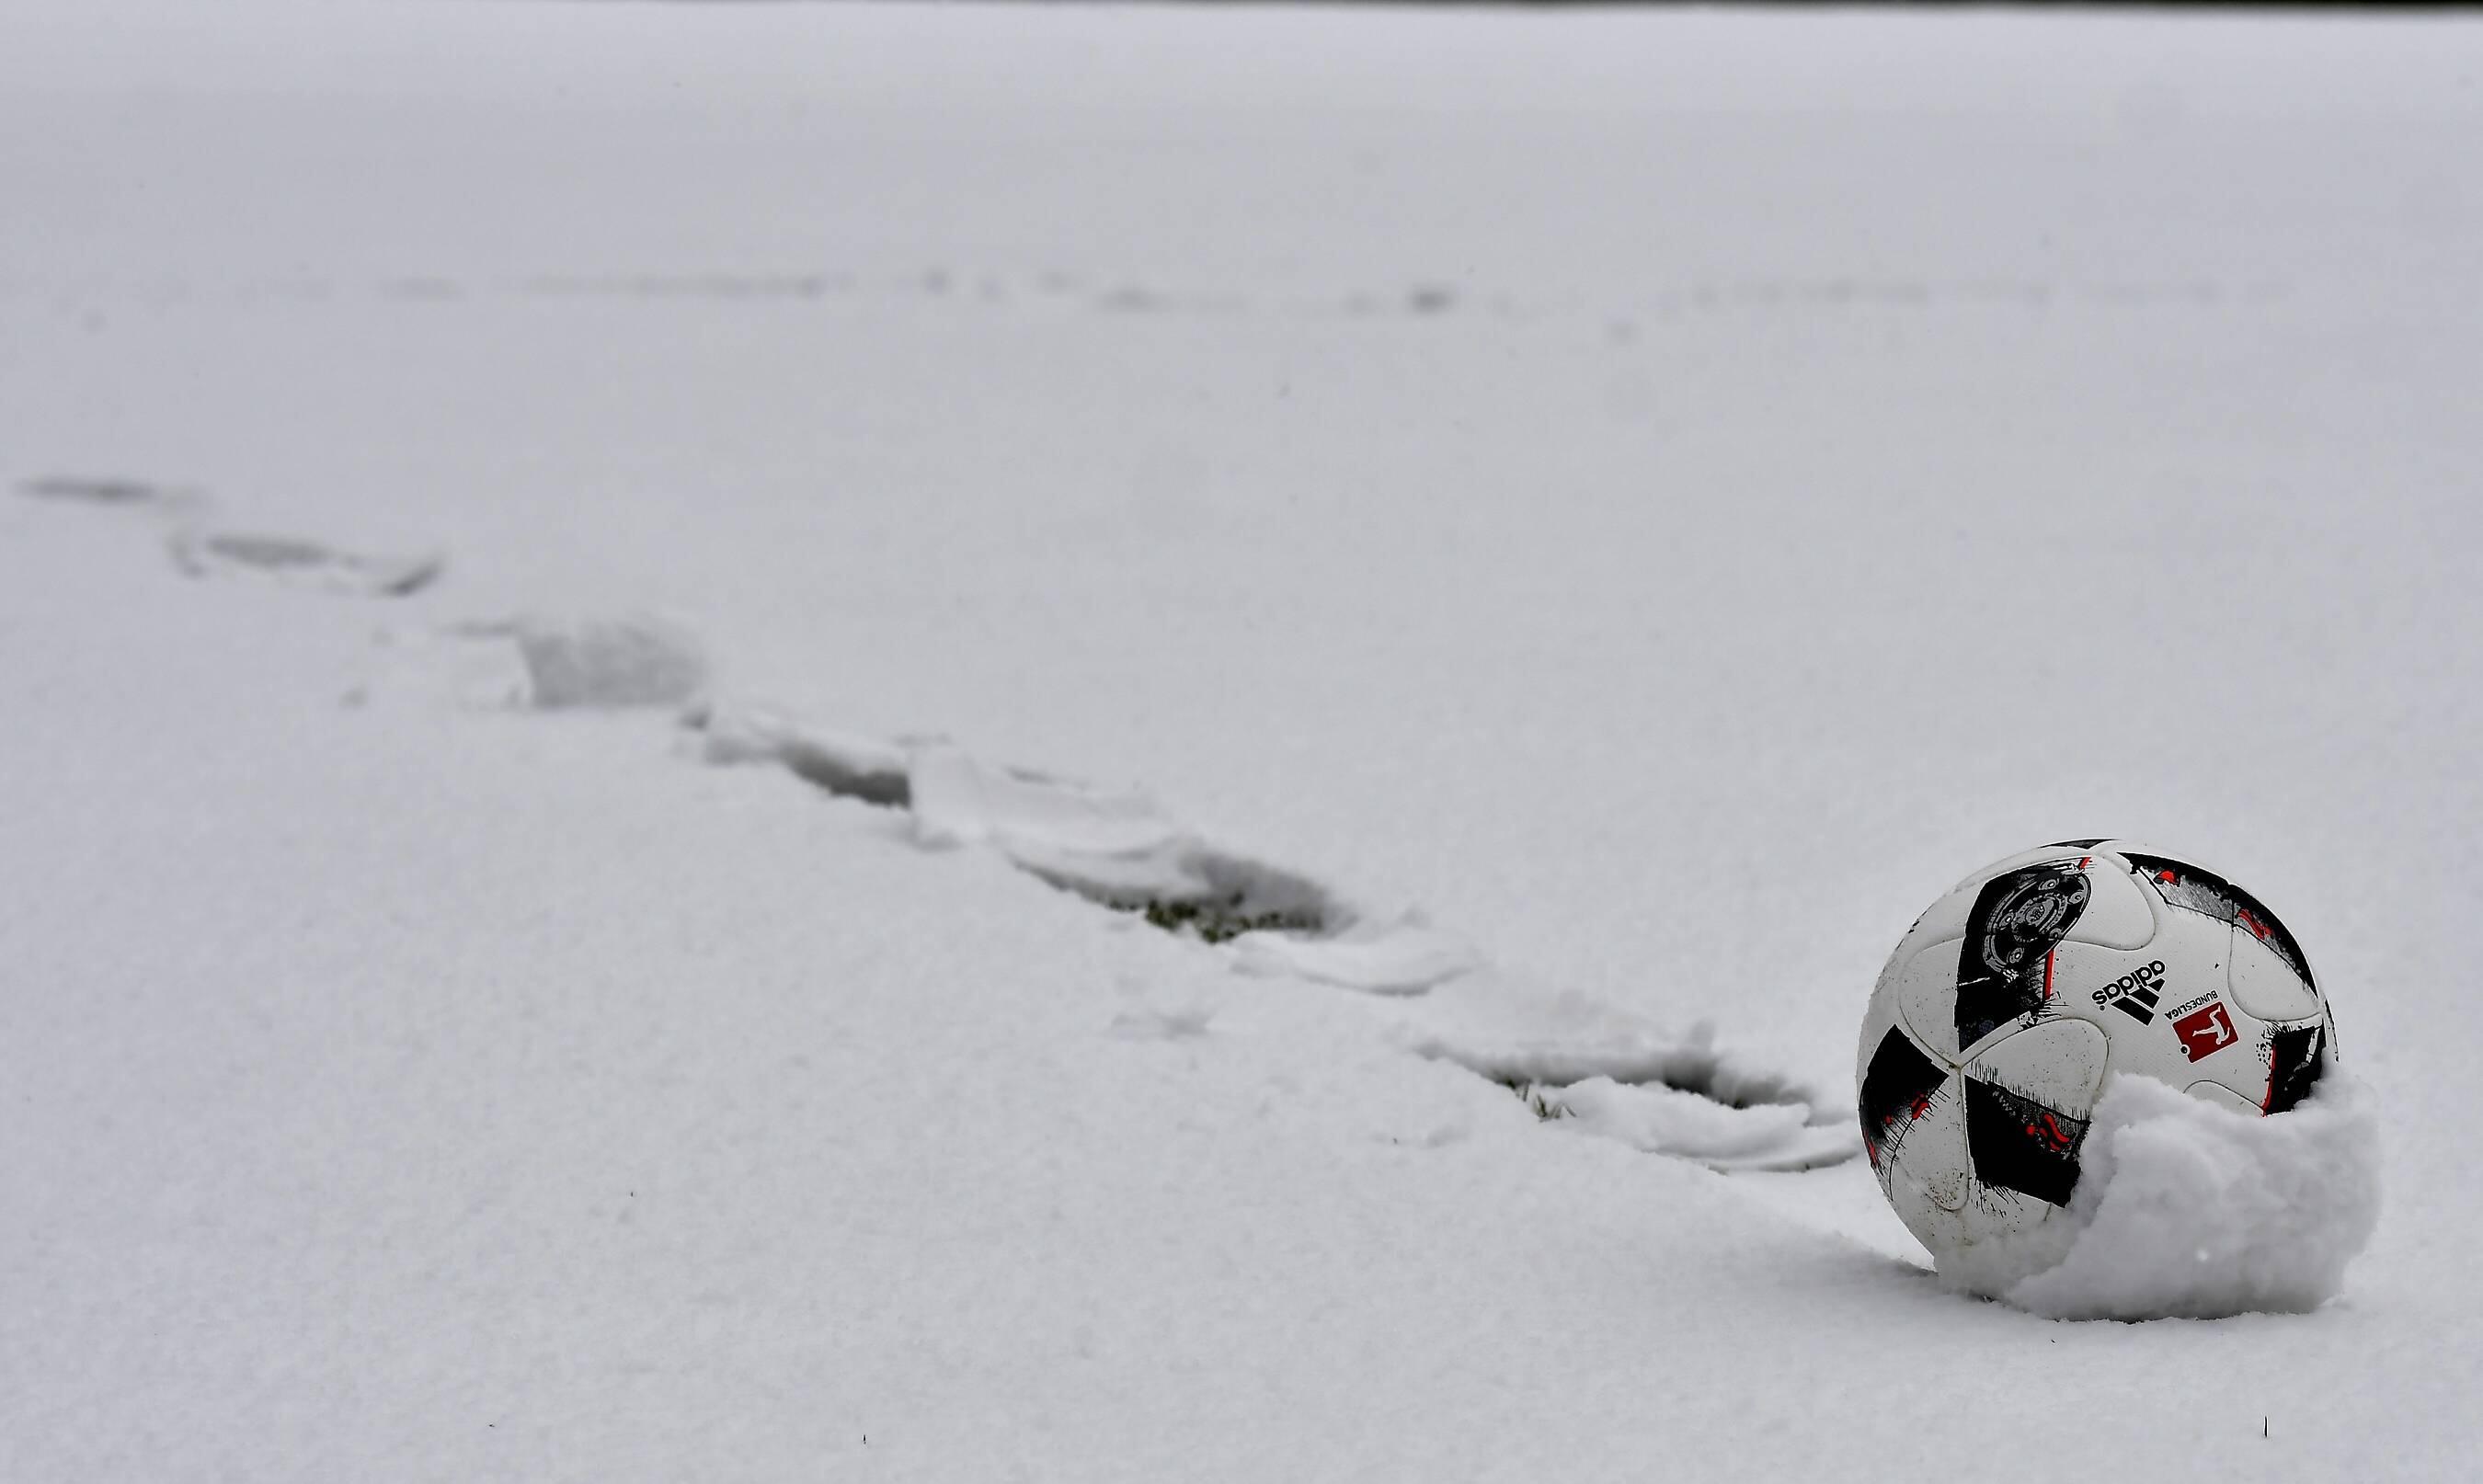 Bild zu Winterpause, Bundesliga, Premier League, Trainingslager